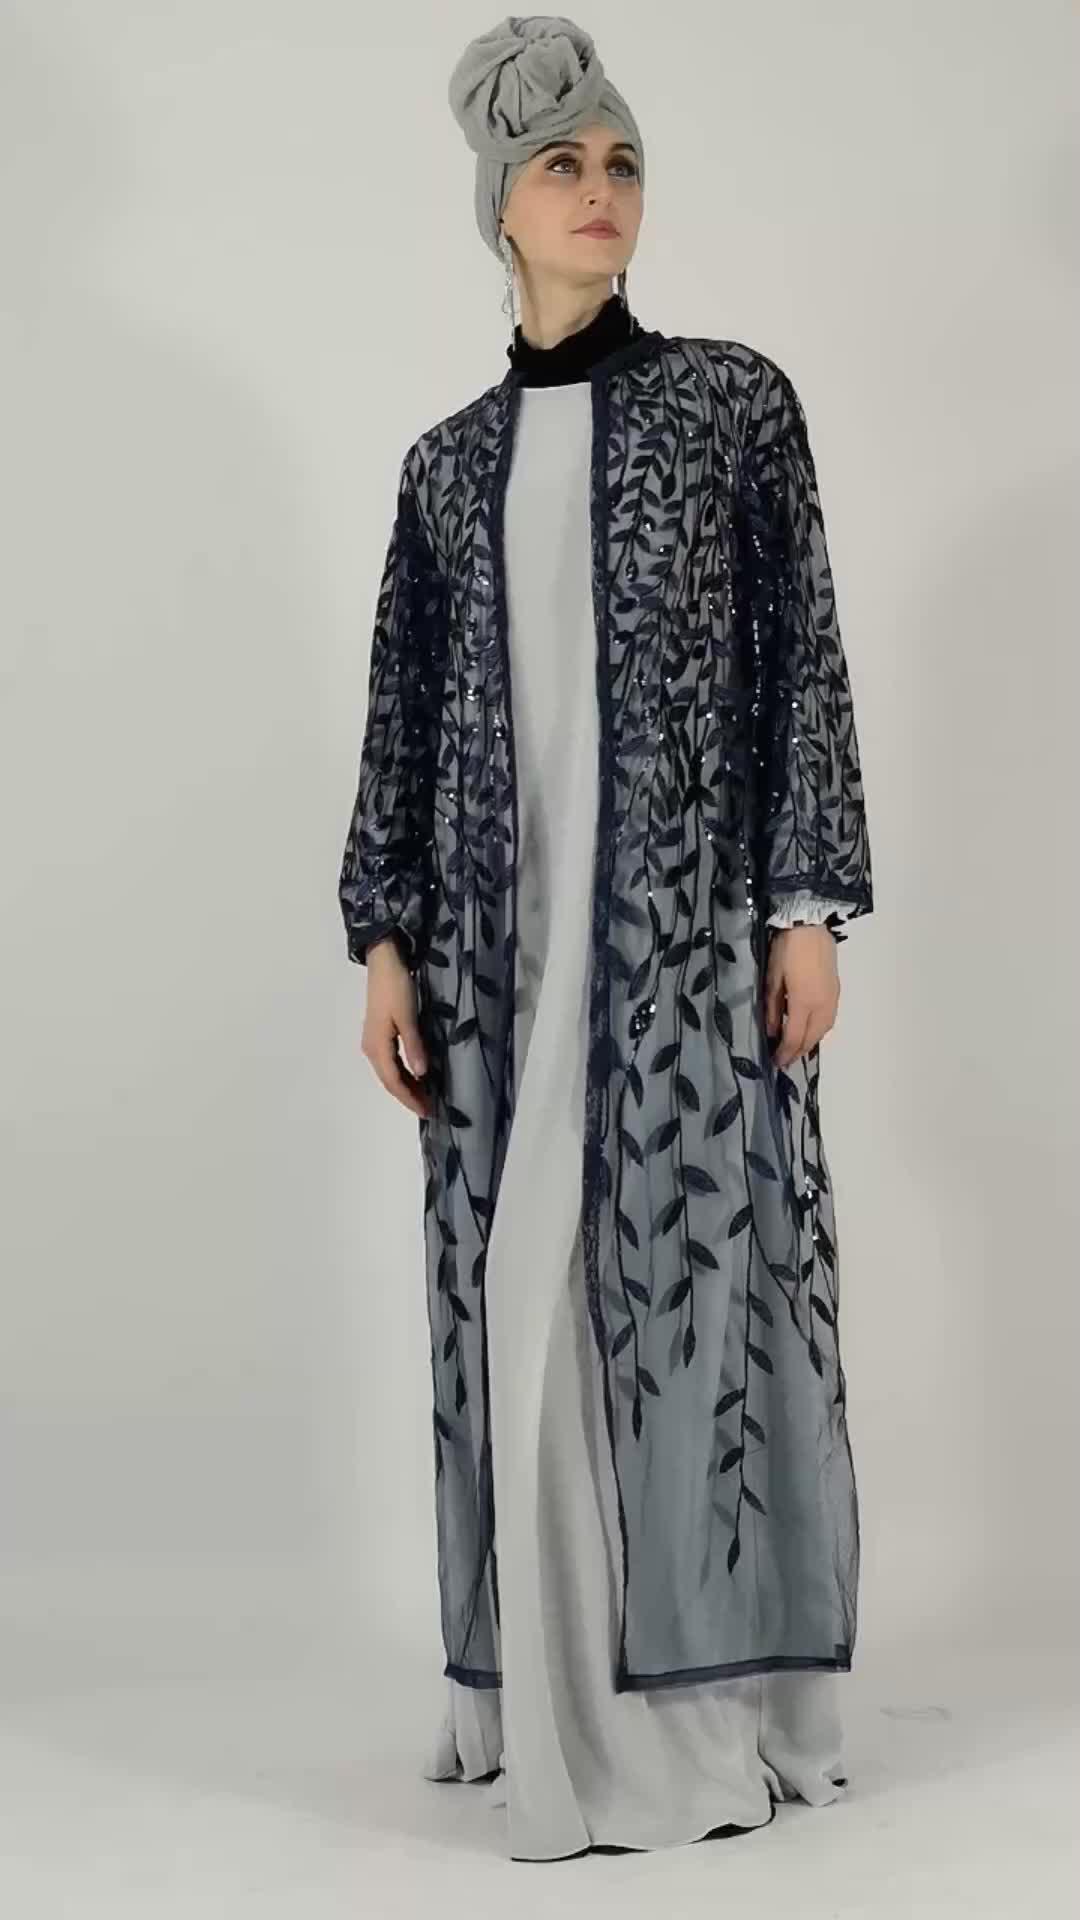 2019 EID Islamic Dubai Dress Modest Long Open Cardigan Leaves Sequins Kimono Women wholesale Islamic clothing abaya factories